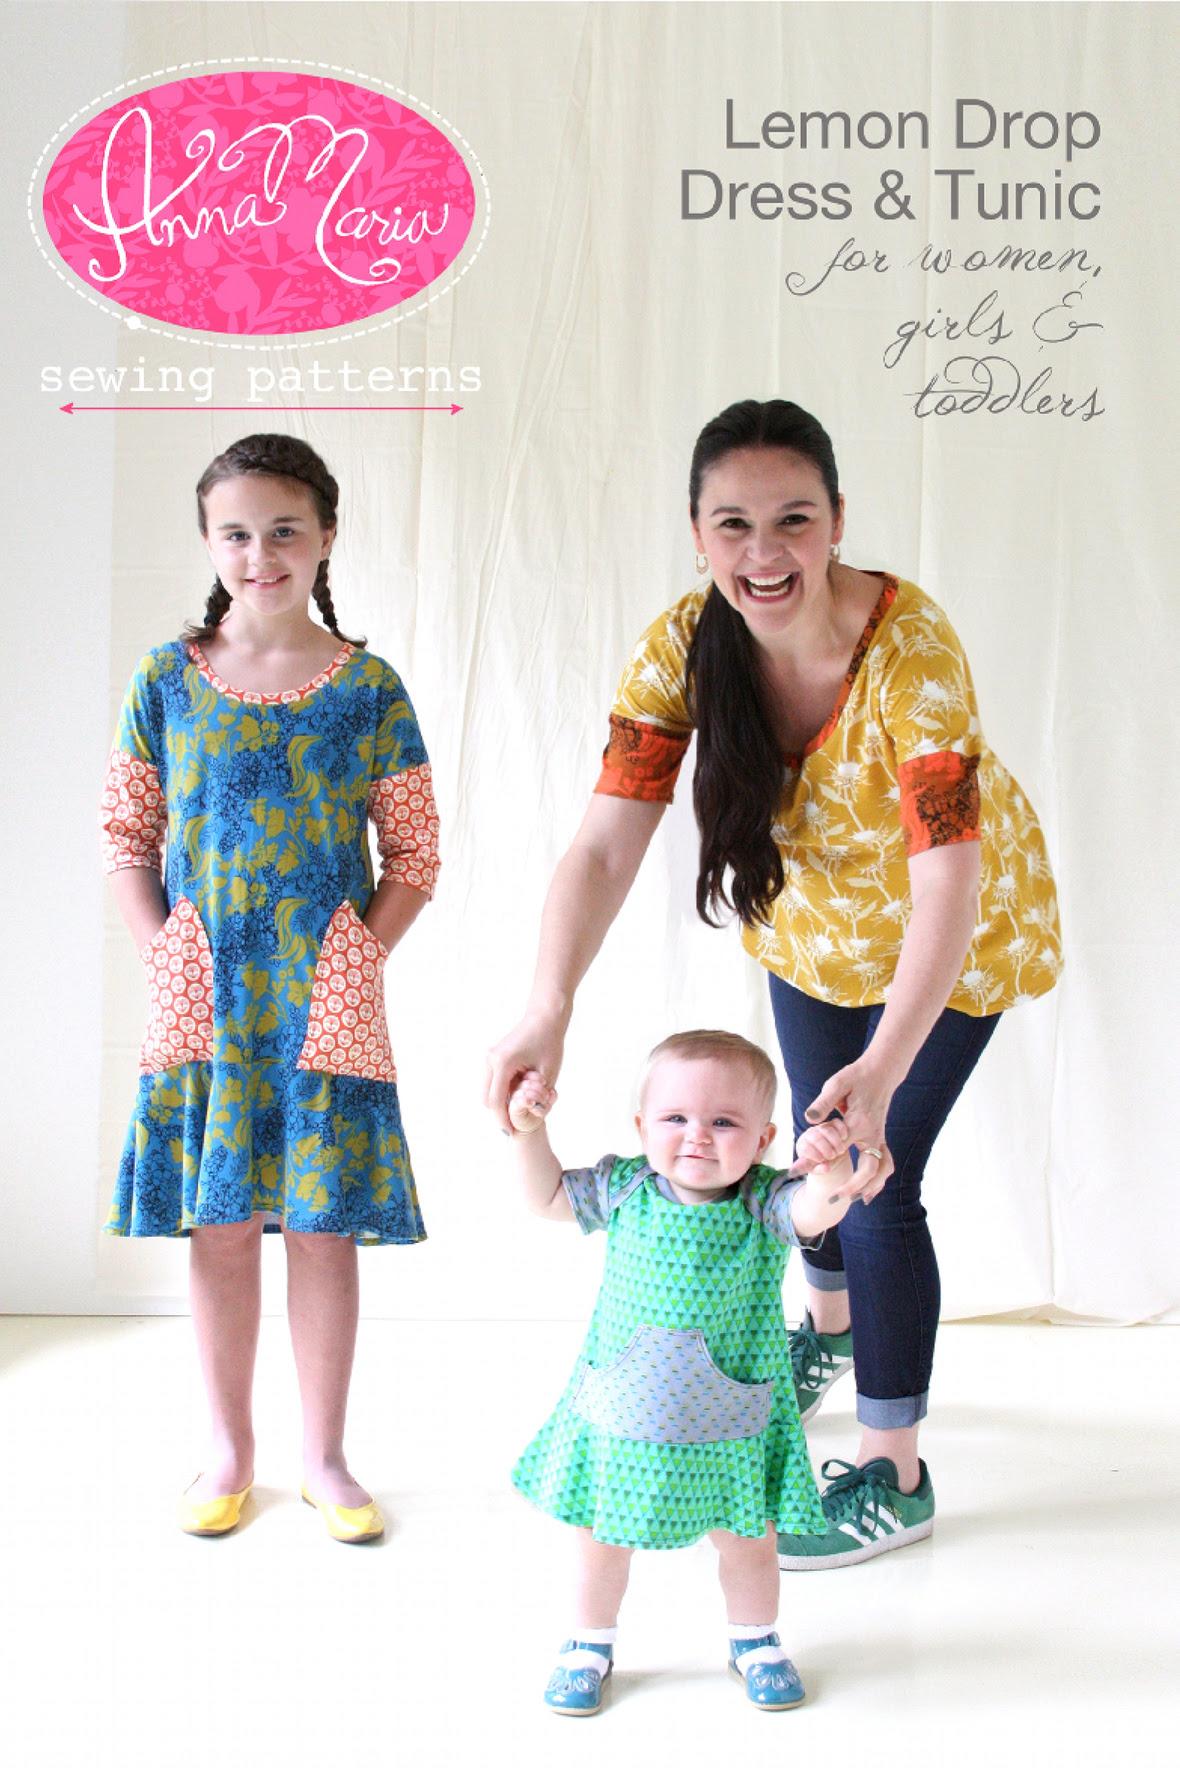 anna maria horner lemon drop dress and tunic sewing pattern